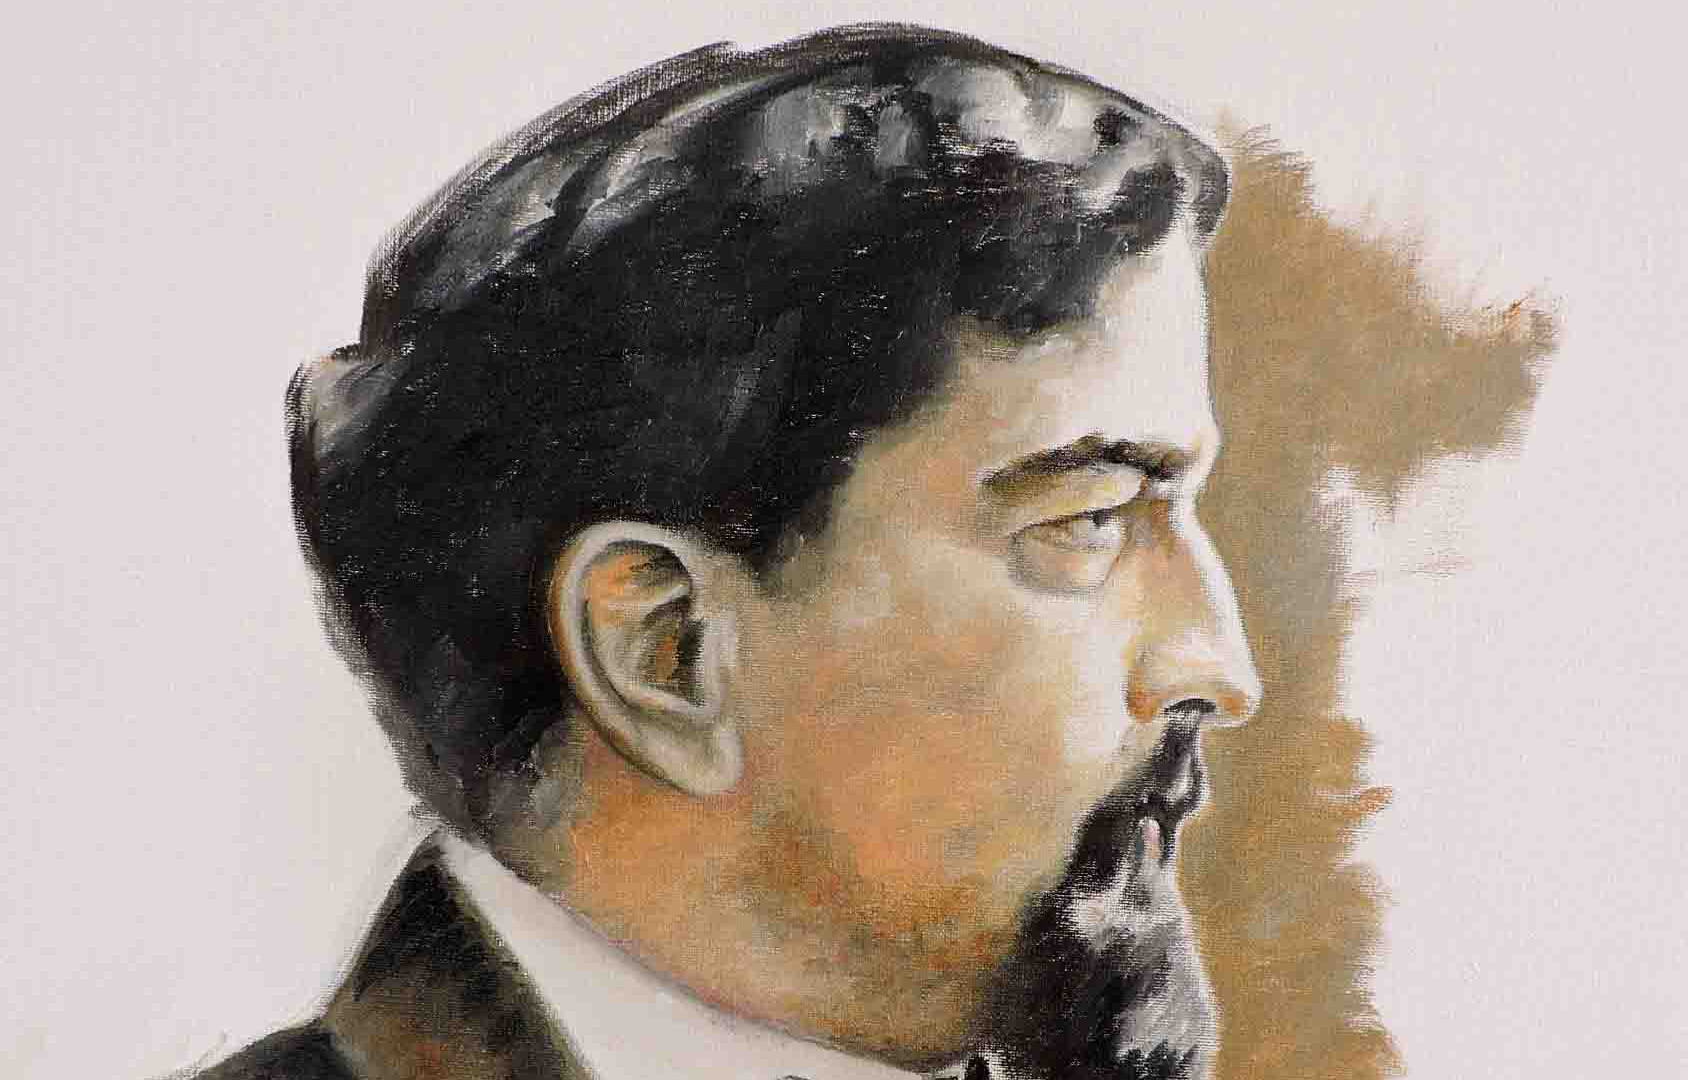 Hommage à Debussy - Mercredi 18 Juillet 2018, 20h30